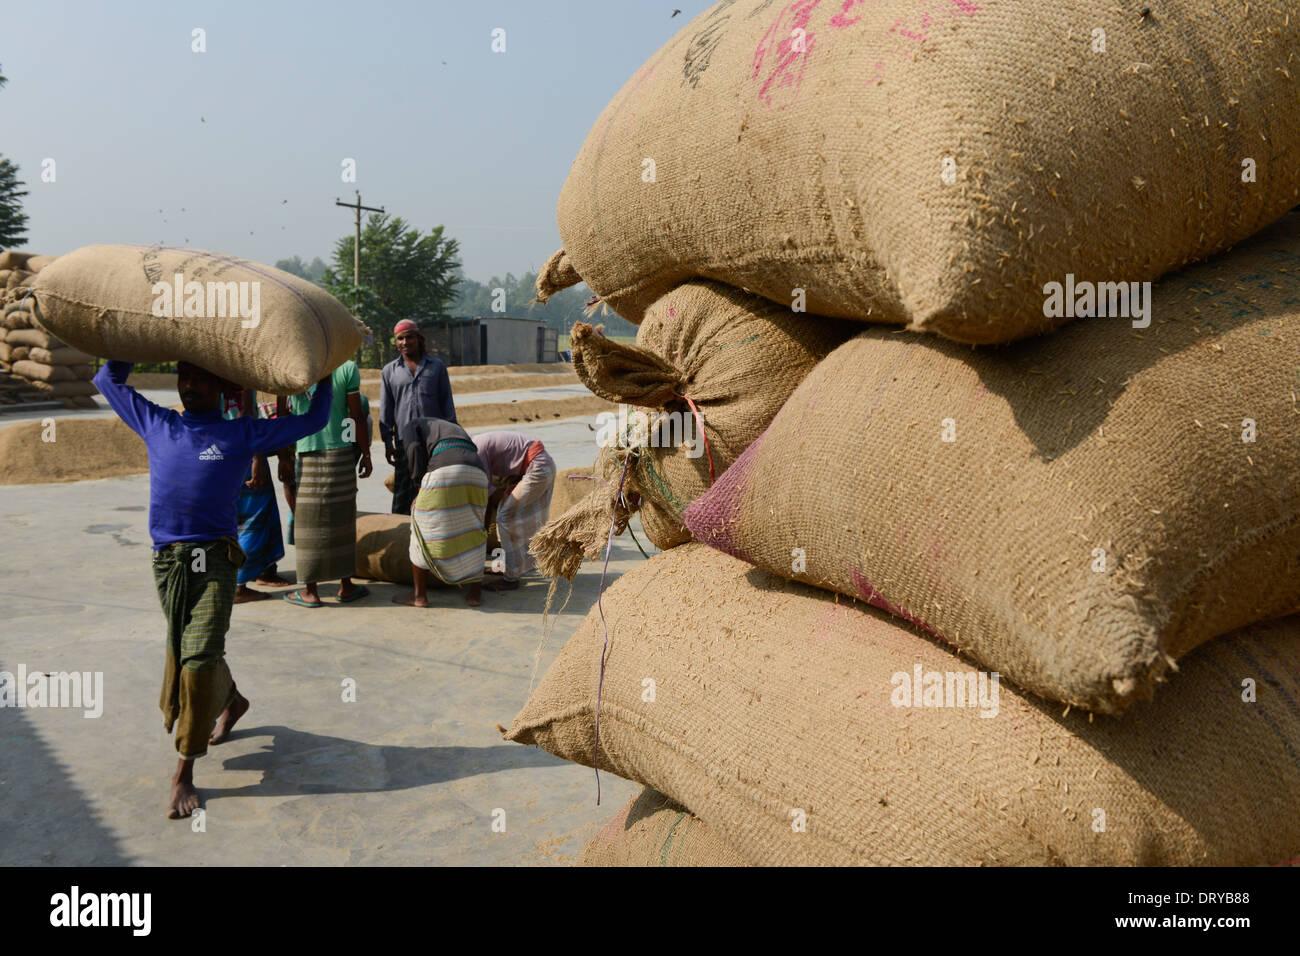 BANGLADESH Tangail, small rice mill near Kalihati, worker turn over paddy for drying in the sun - Stock Image